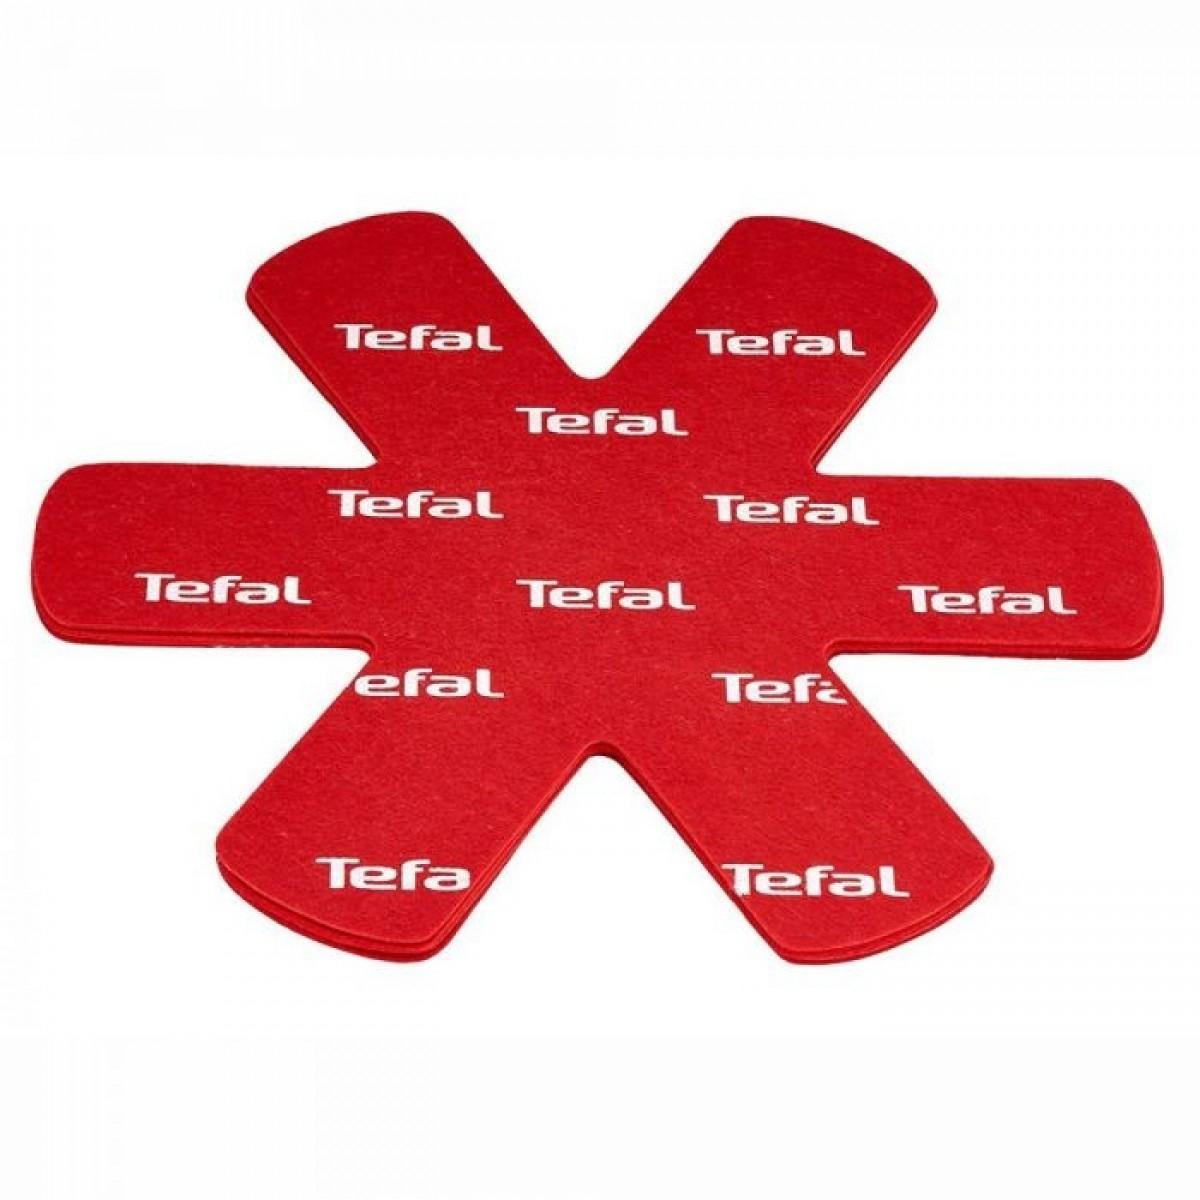 TEFAL Pandebeskyttere rød 4 stk